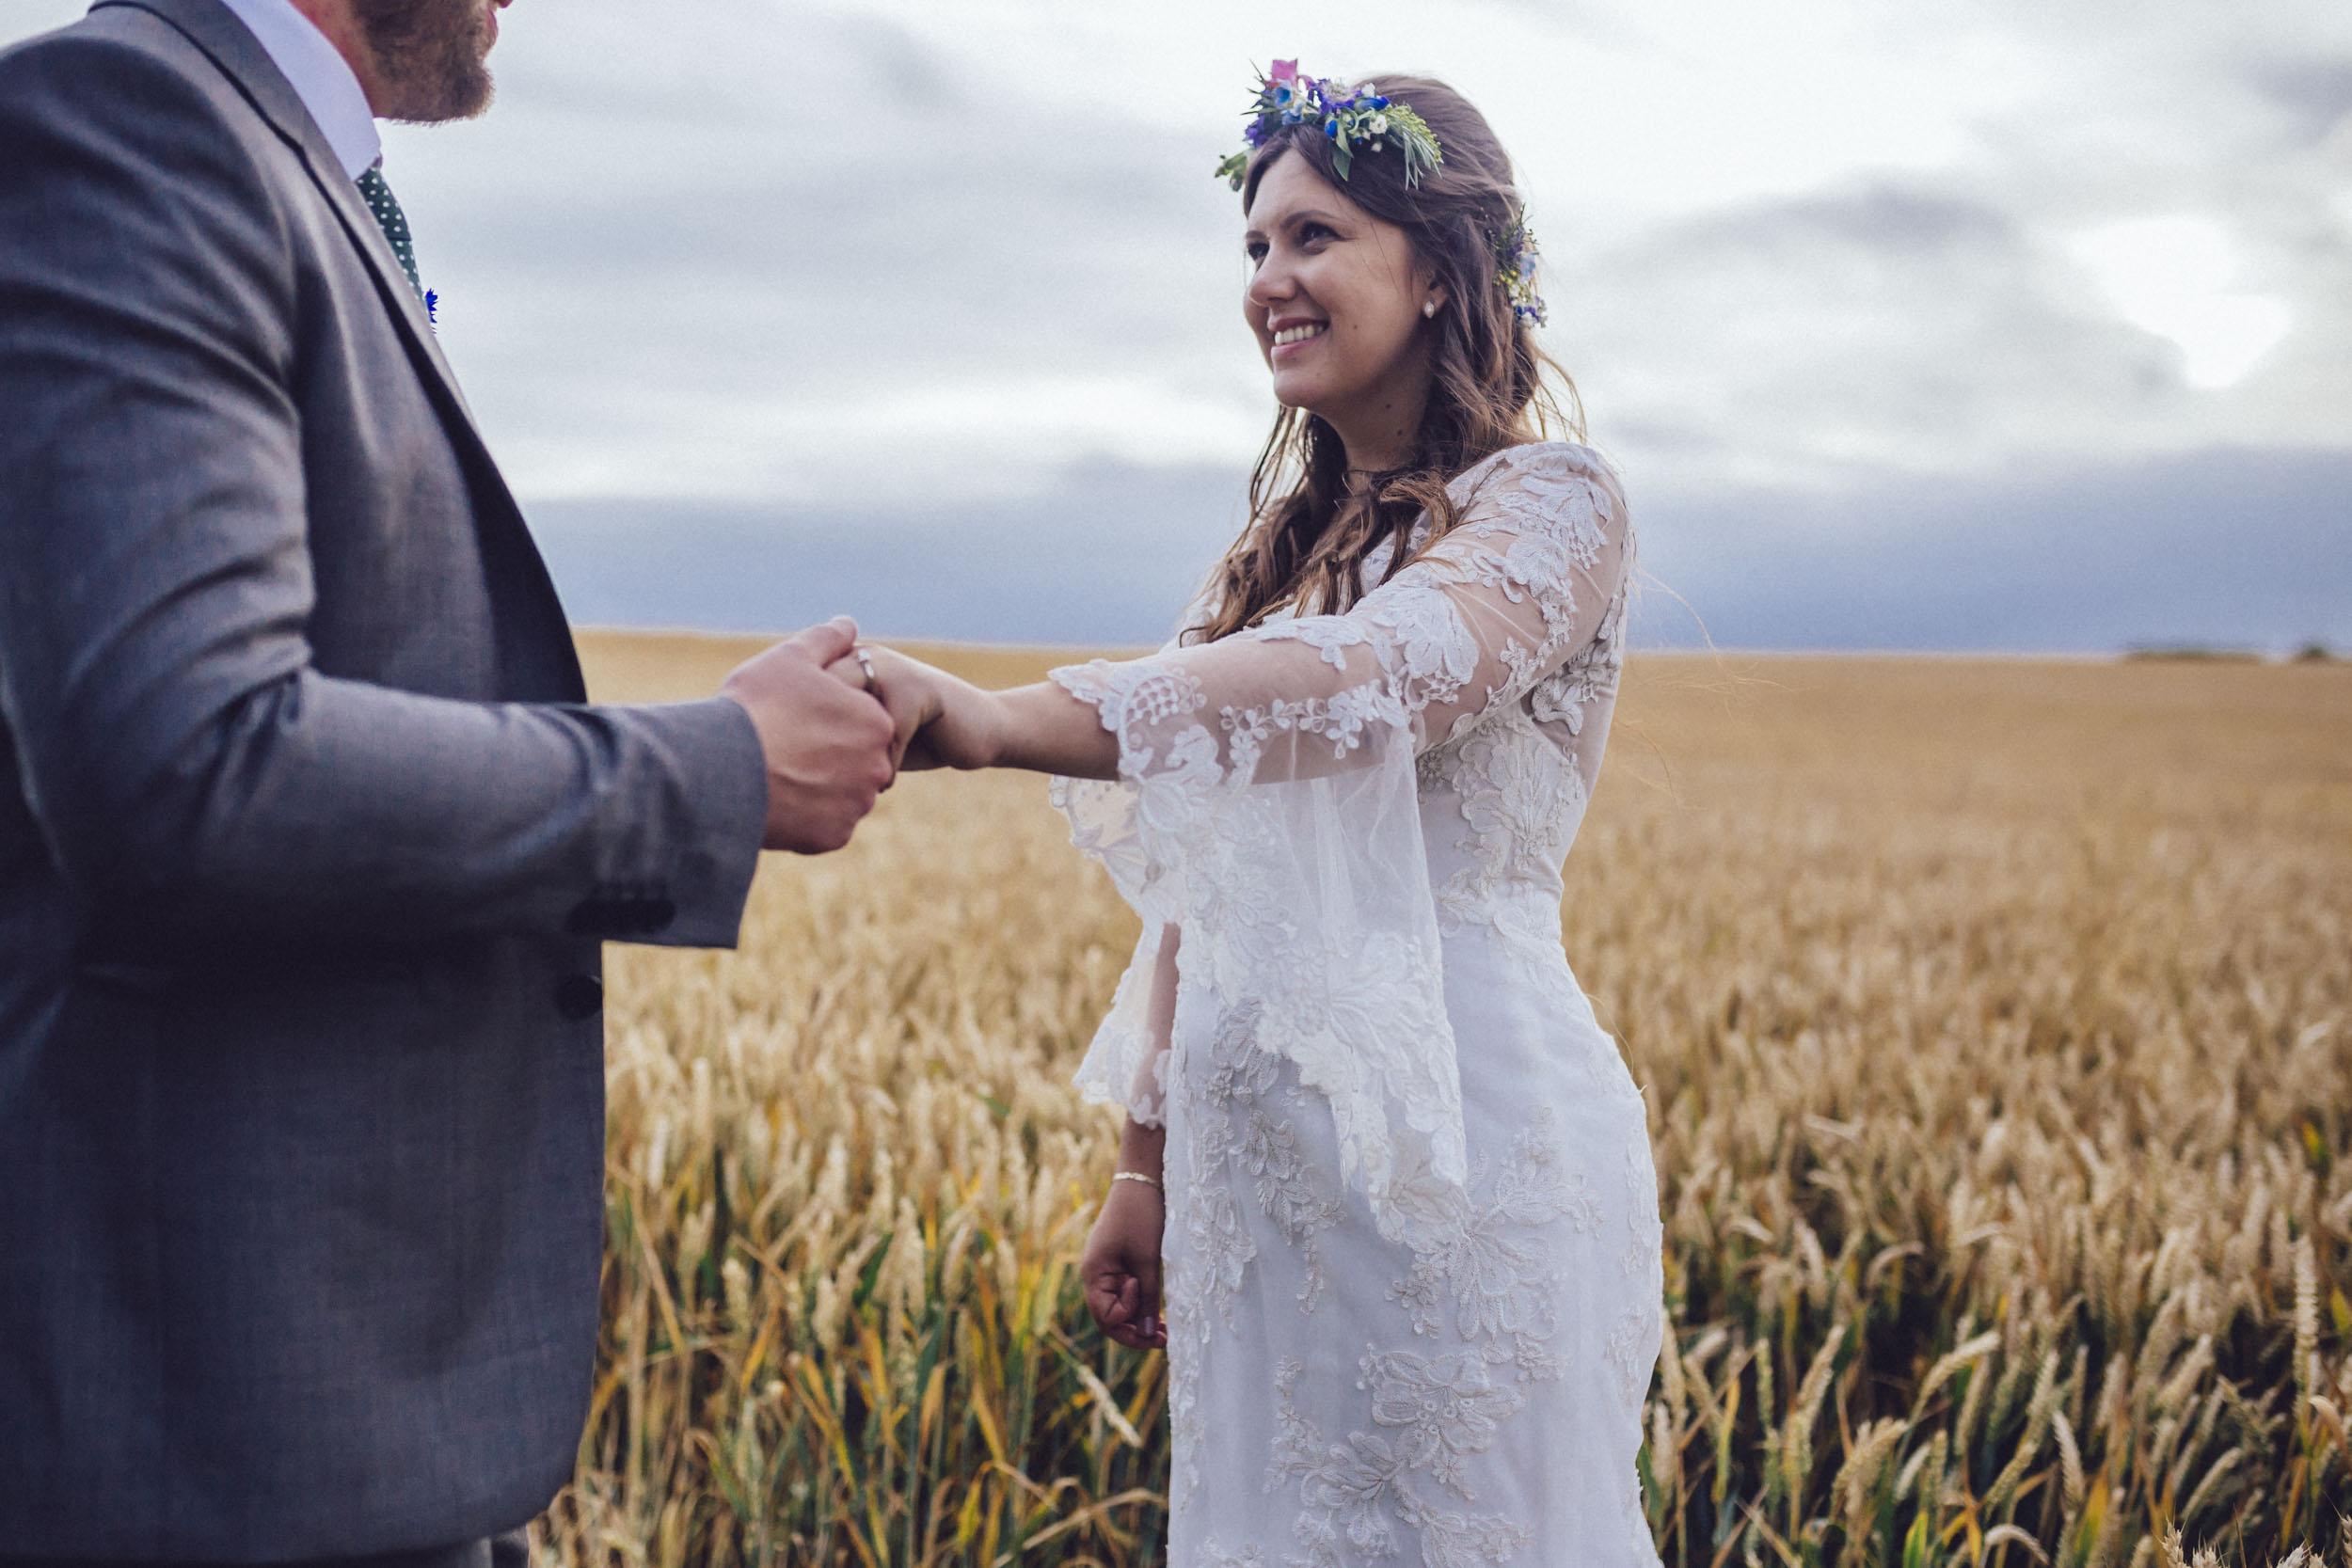 25Curious Rose Wedding Photography- Laura Rhodes- Newton Park Farm- Birmingham Artistic wedding photography-bride- wedding dress lace.jpg